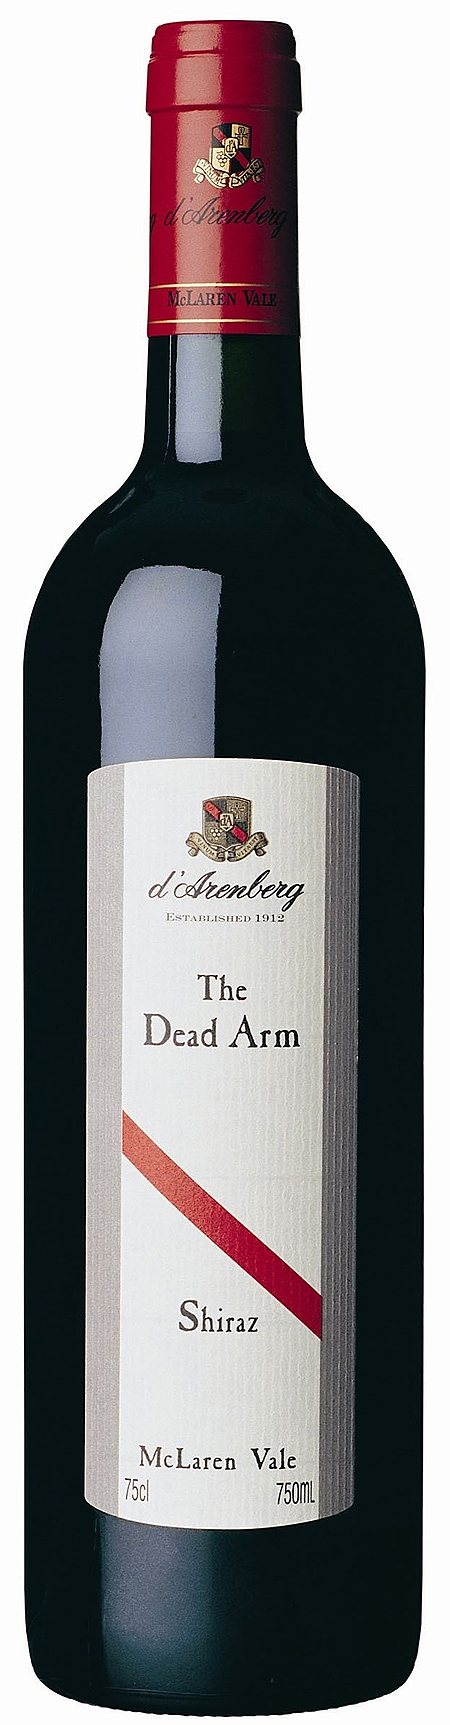 d'Arenberg The Dead Arm Shiraz 2016